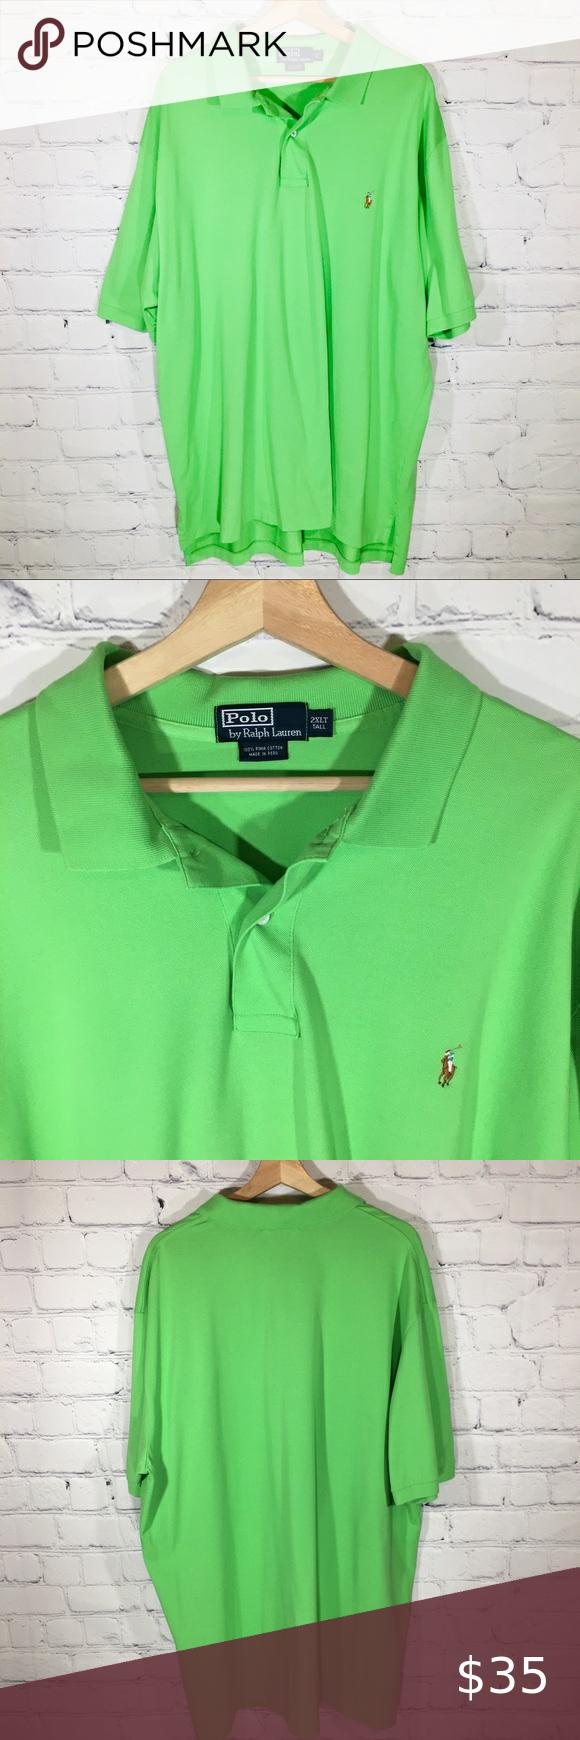 Polo By Ralph Lauren Bright Green Polo Shirt 2xlt Green Polo Shirts Polo Ralph Lauren Shirts